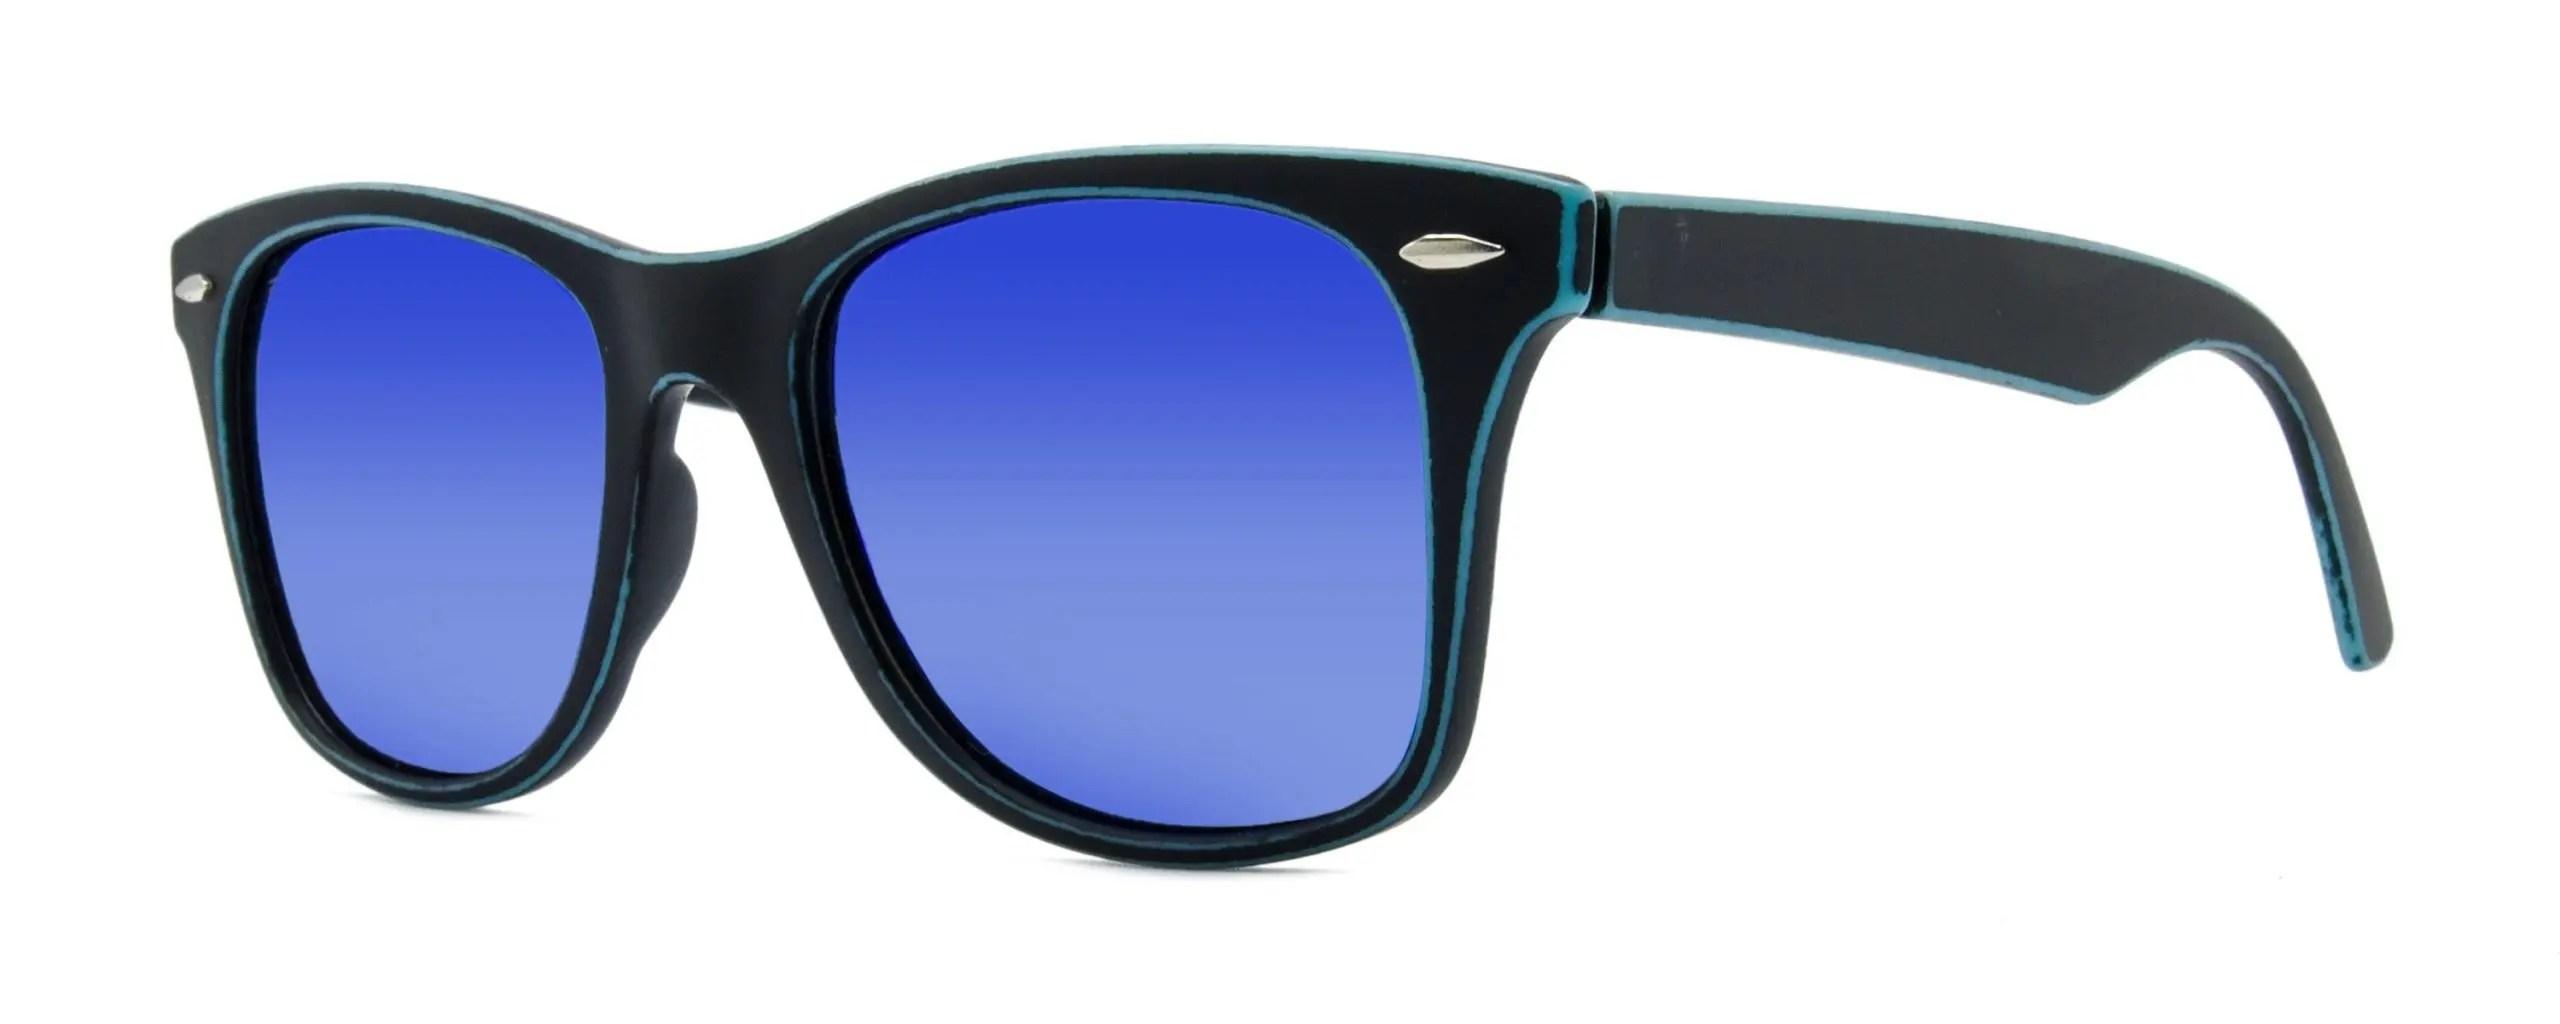 Jude - Matte Black - Blue Polarized Mirror Lenses - Angle